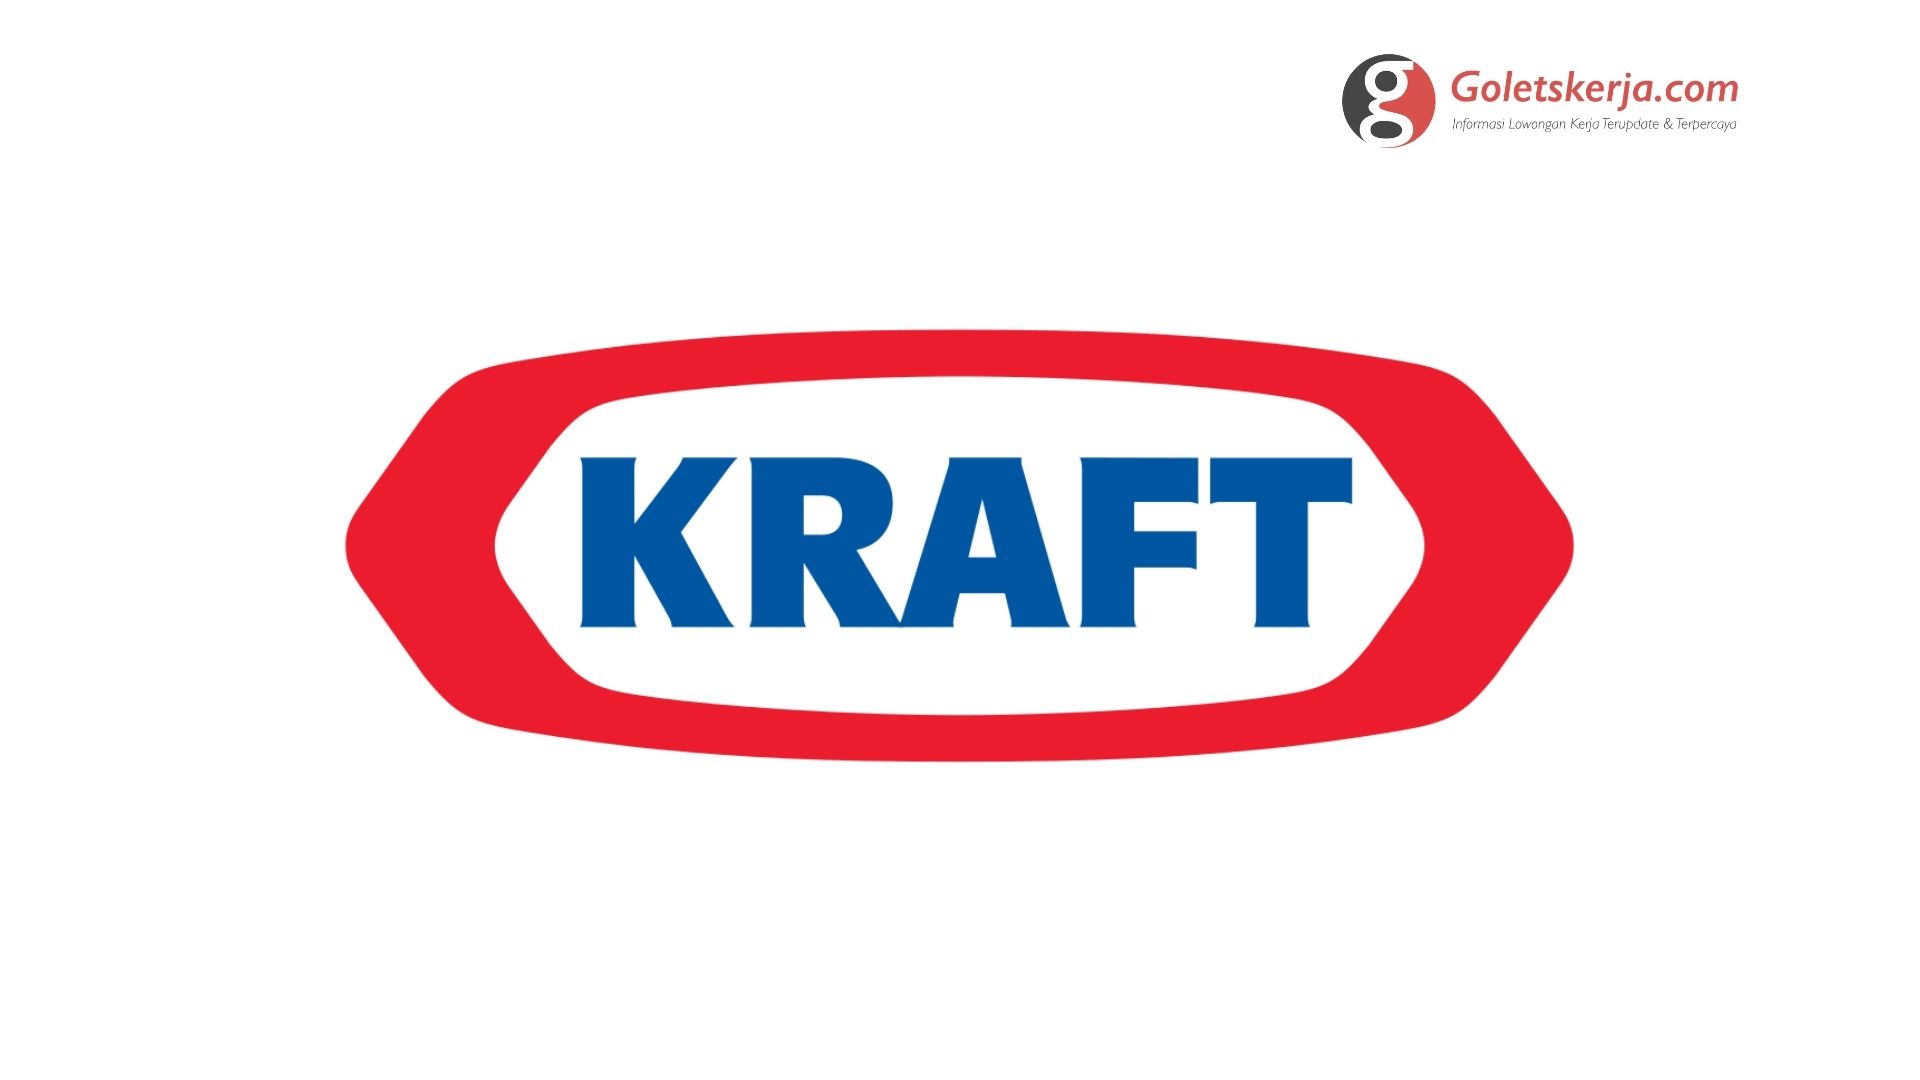 Lowongan Kerja PT Kraft Ultrajaya Indonesia